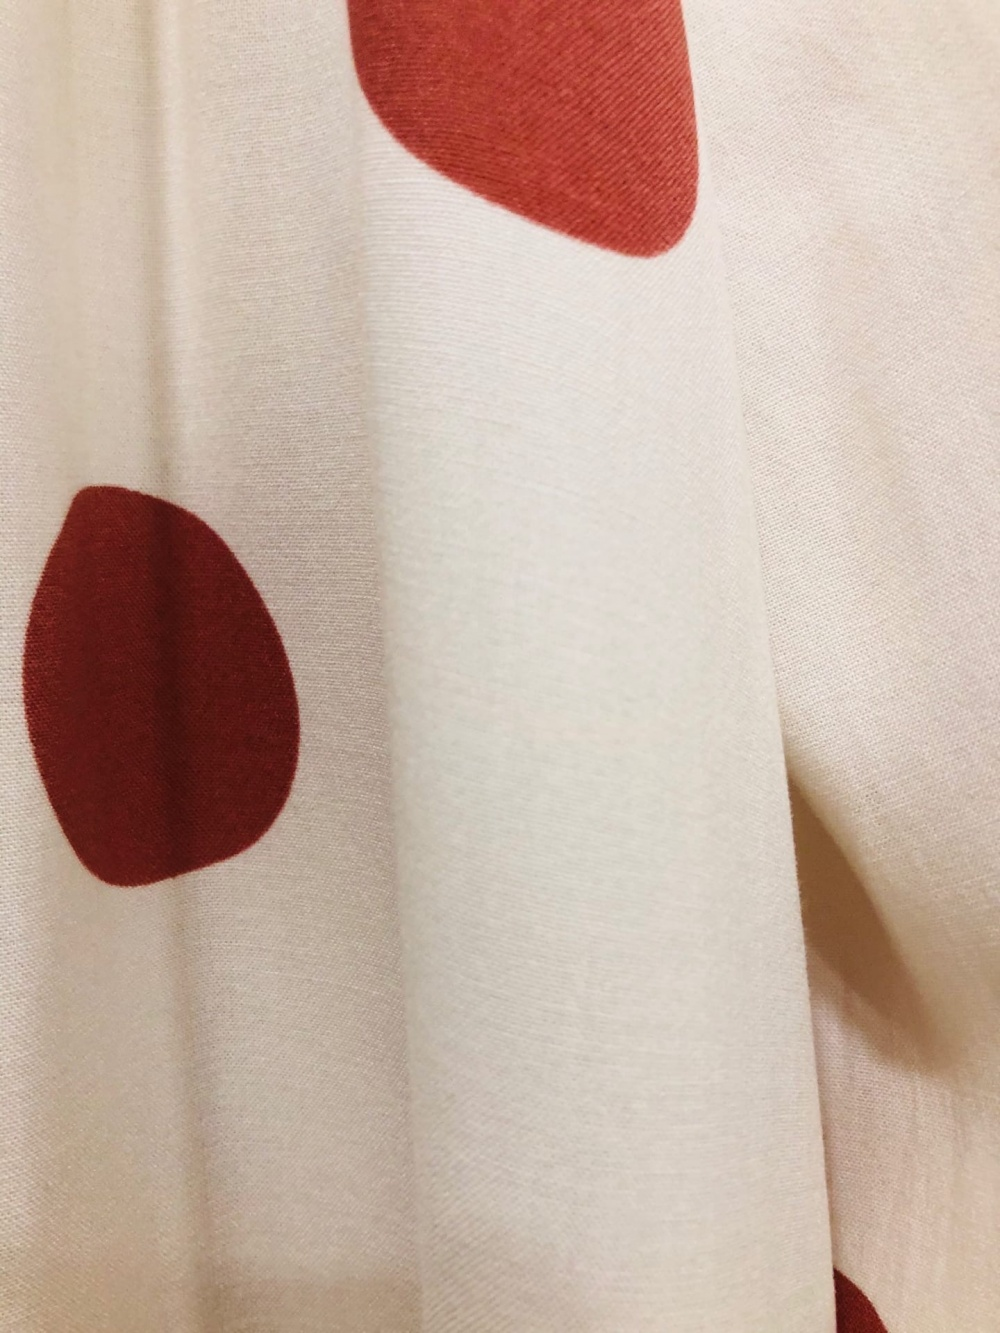 Блузка  New Look. Размер M-L.